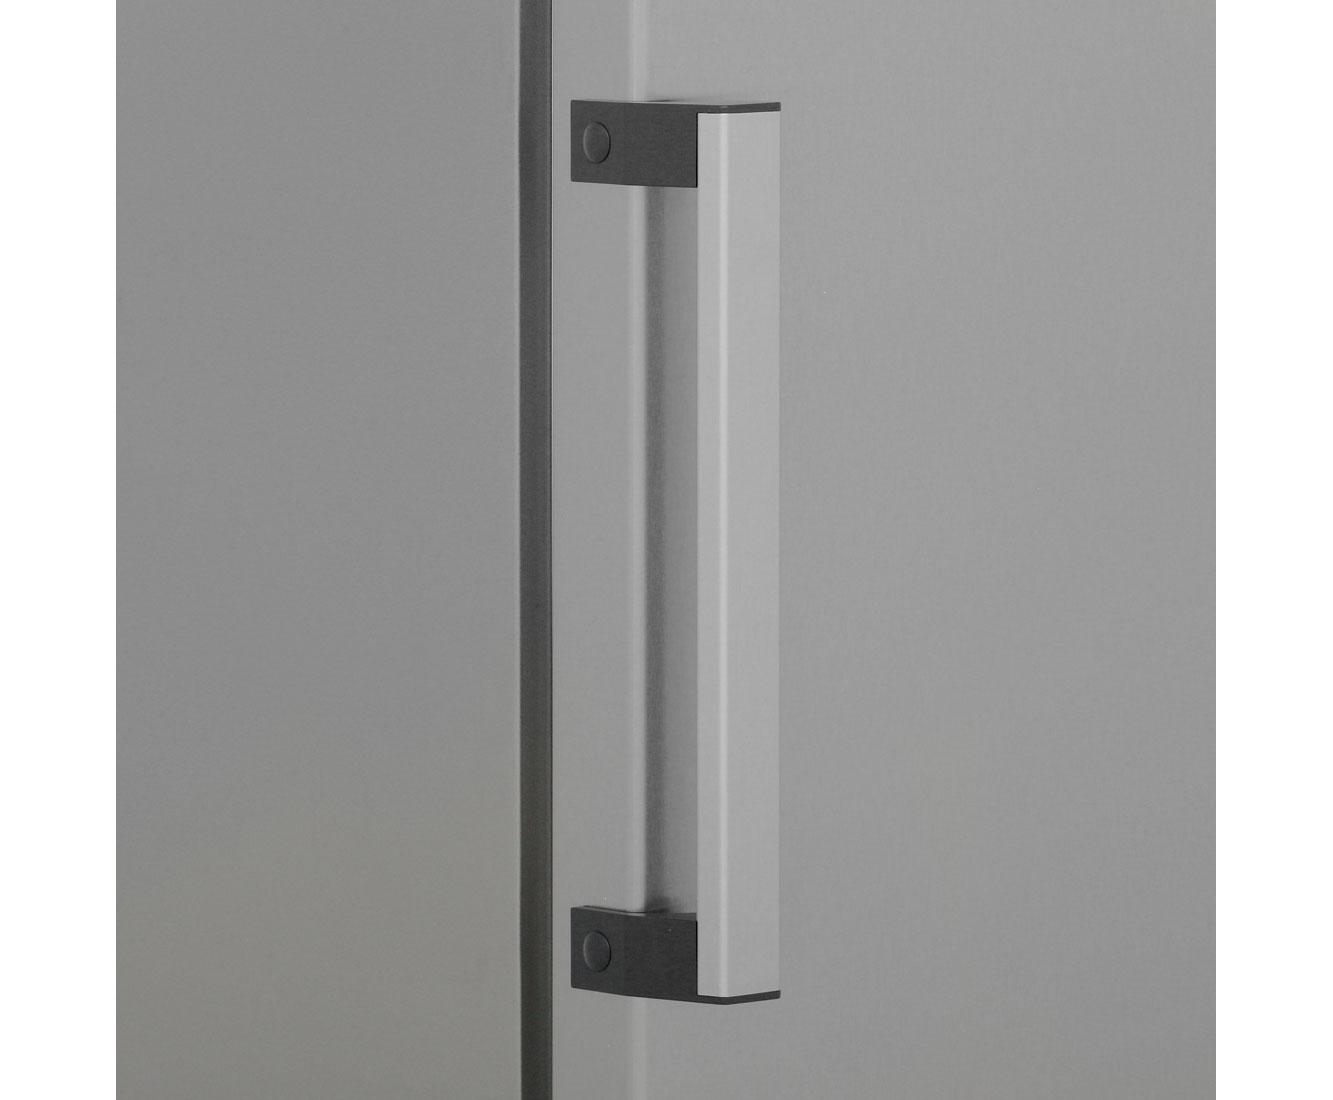 Kühlschrank Edelstahl : ᐅ lg electronics gsj nebz a kühlschrank side by side